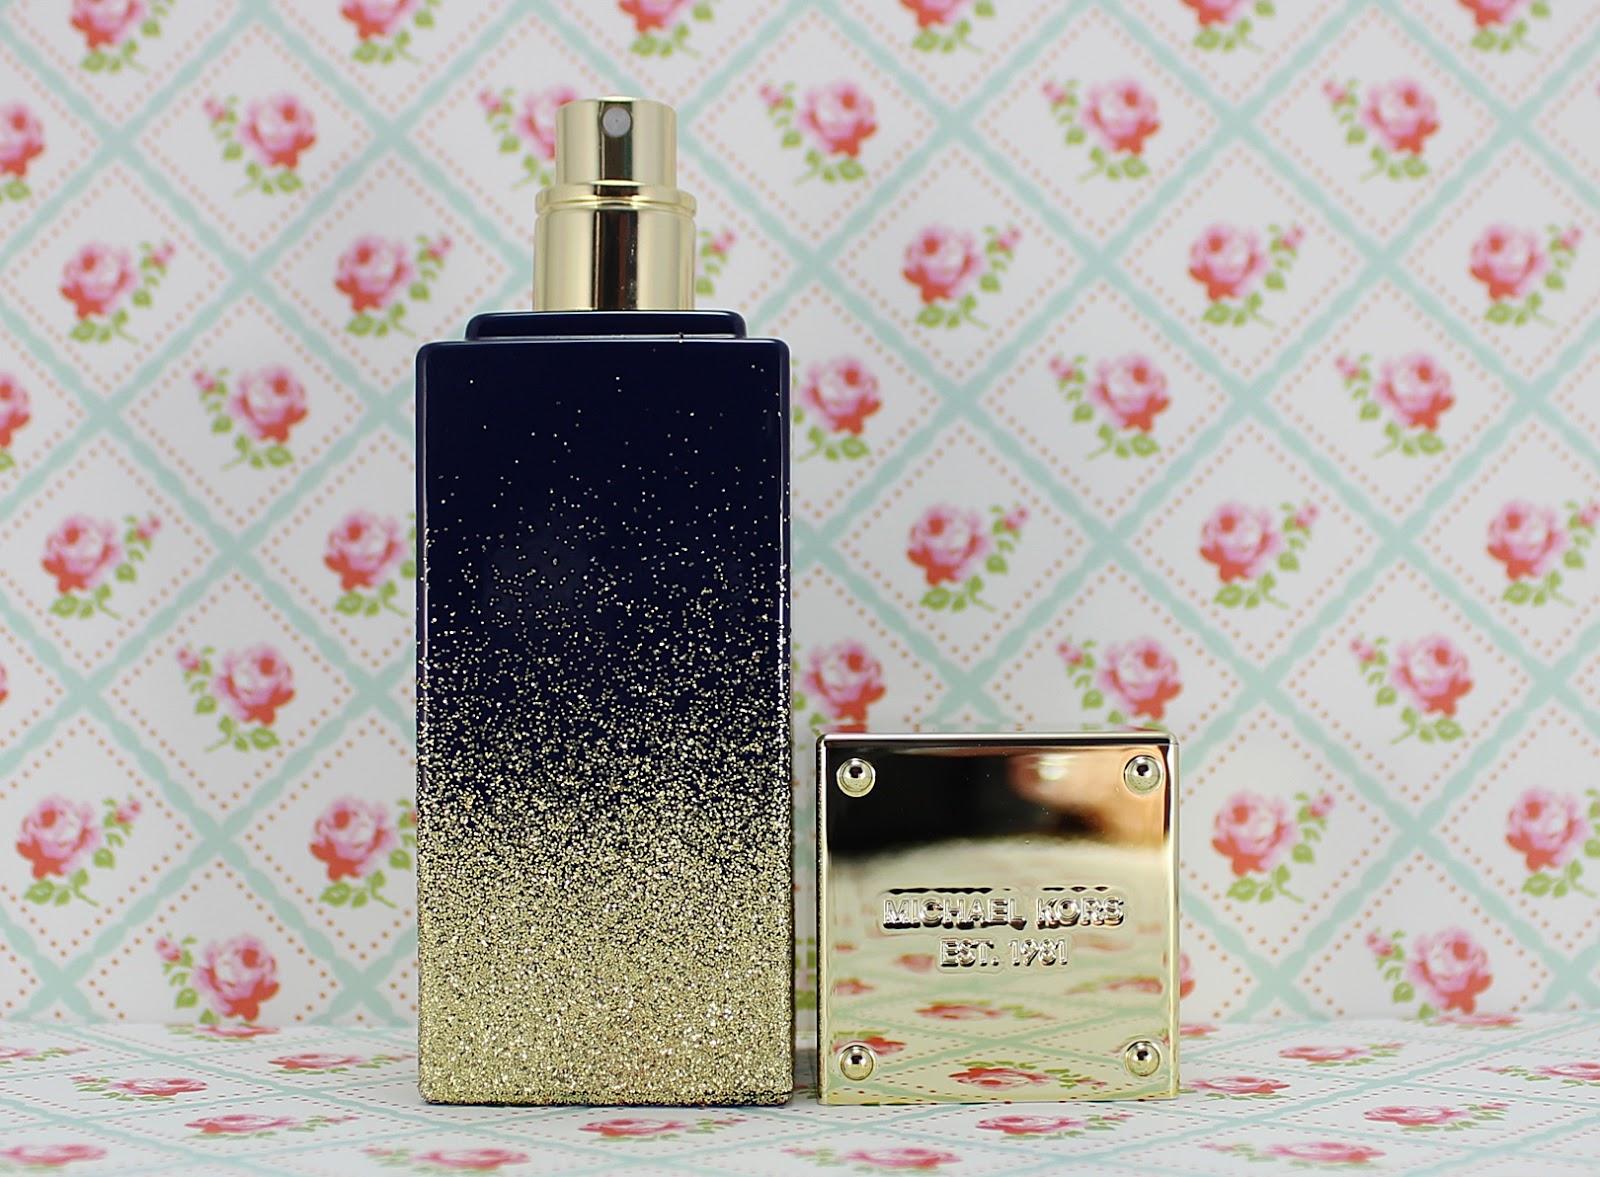 Michael Kors Midnight Shimmer Perfume beauty blog